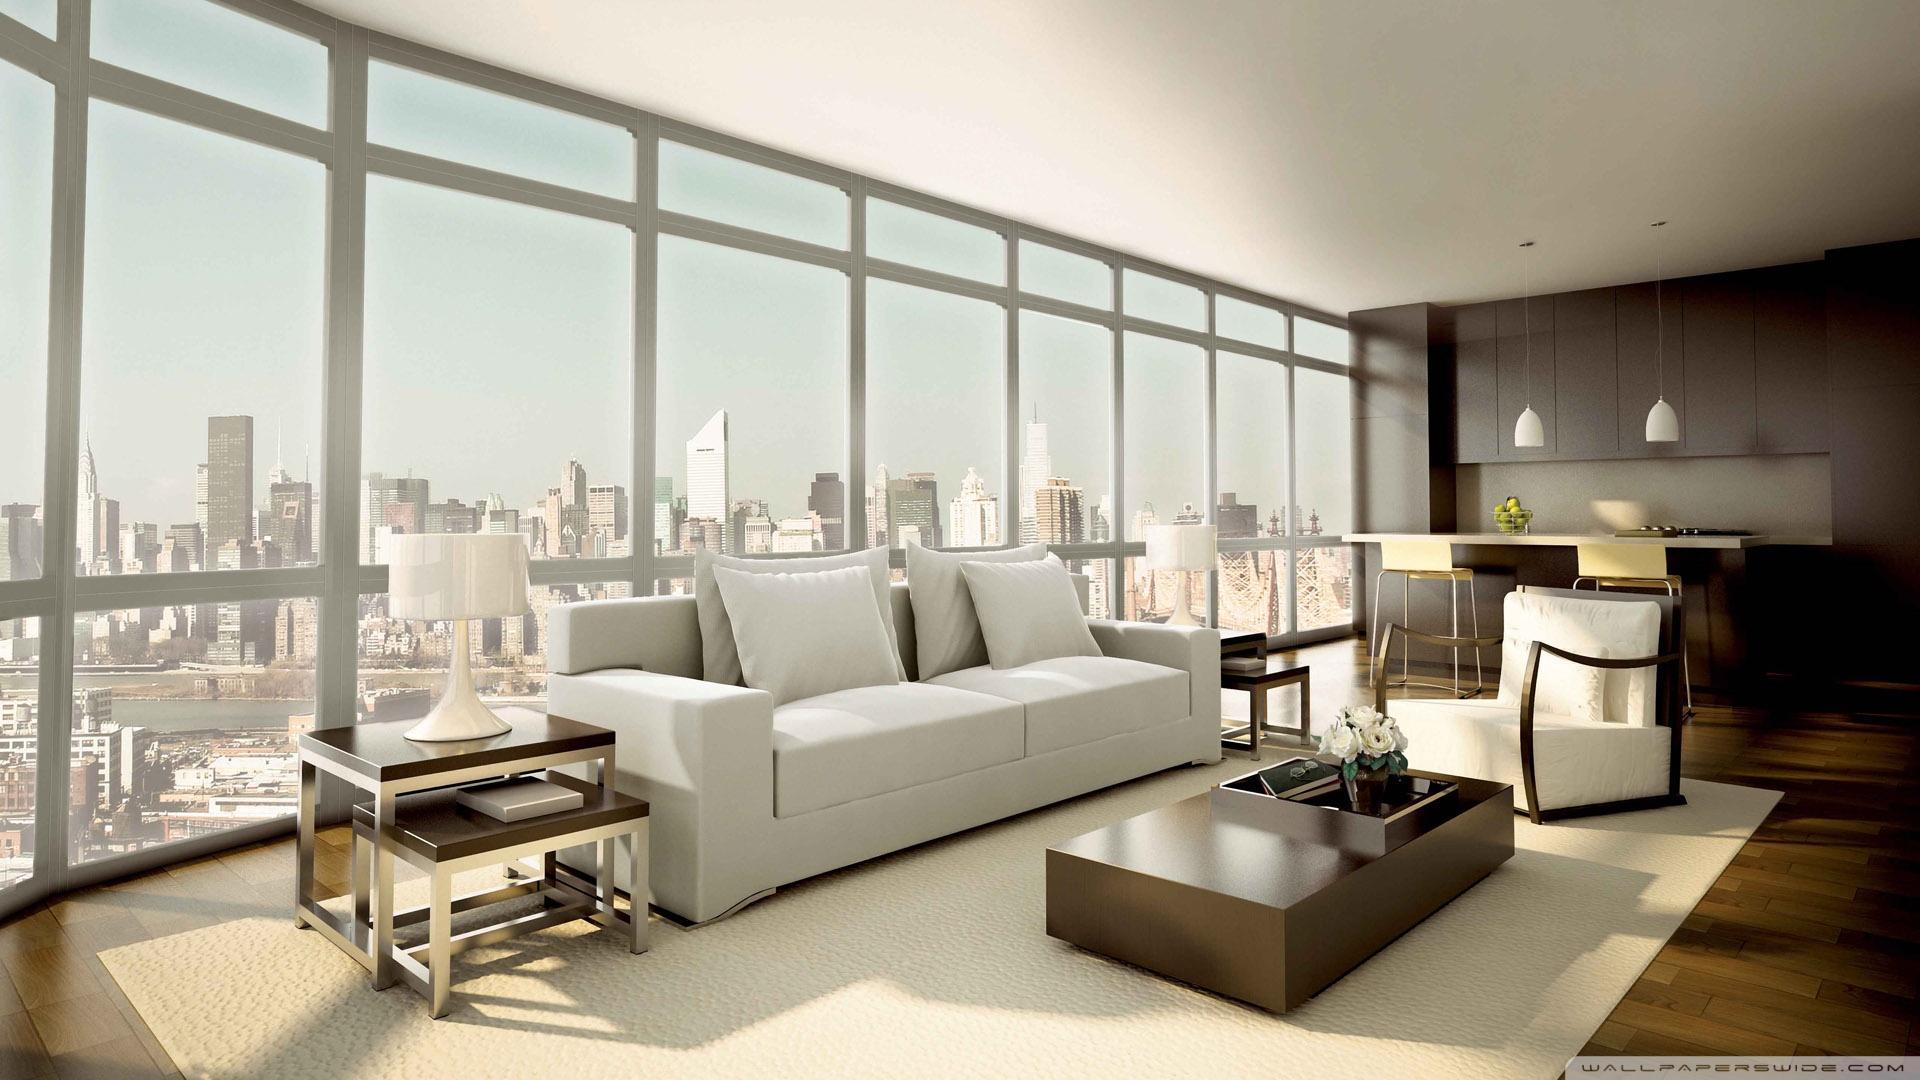 interior-wallpapers-28651-735135.jpg